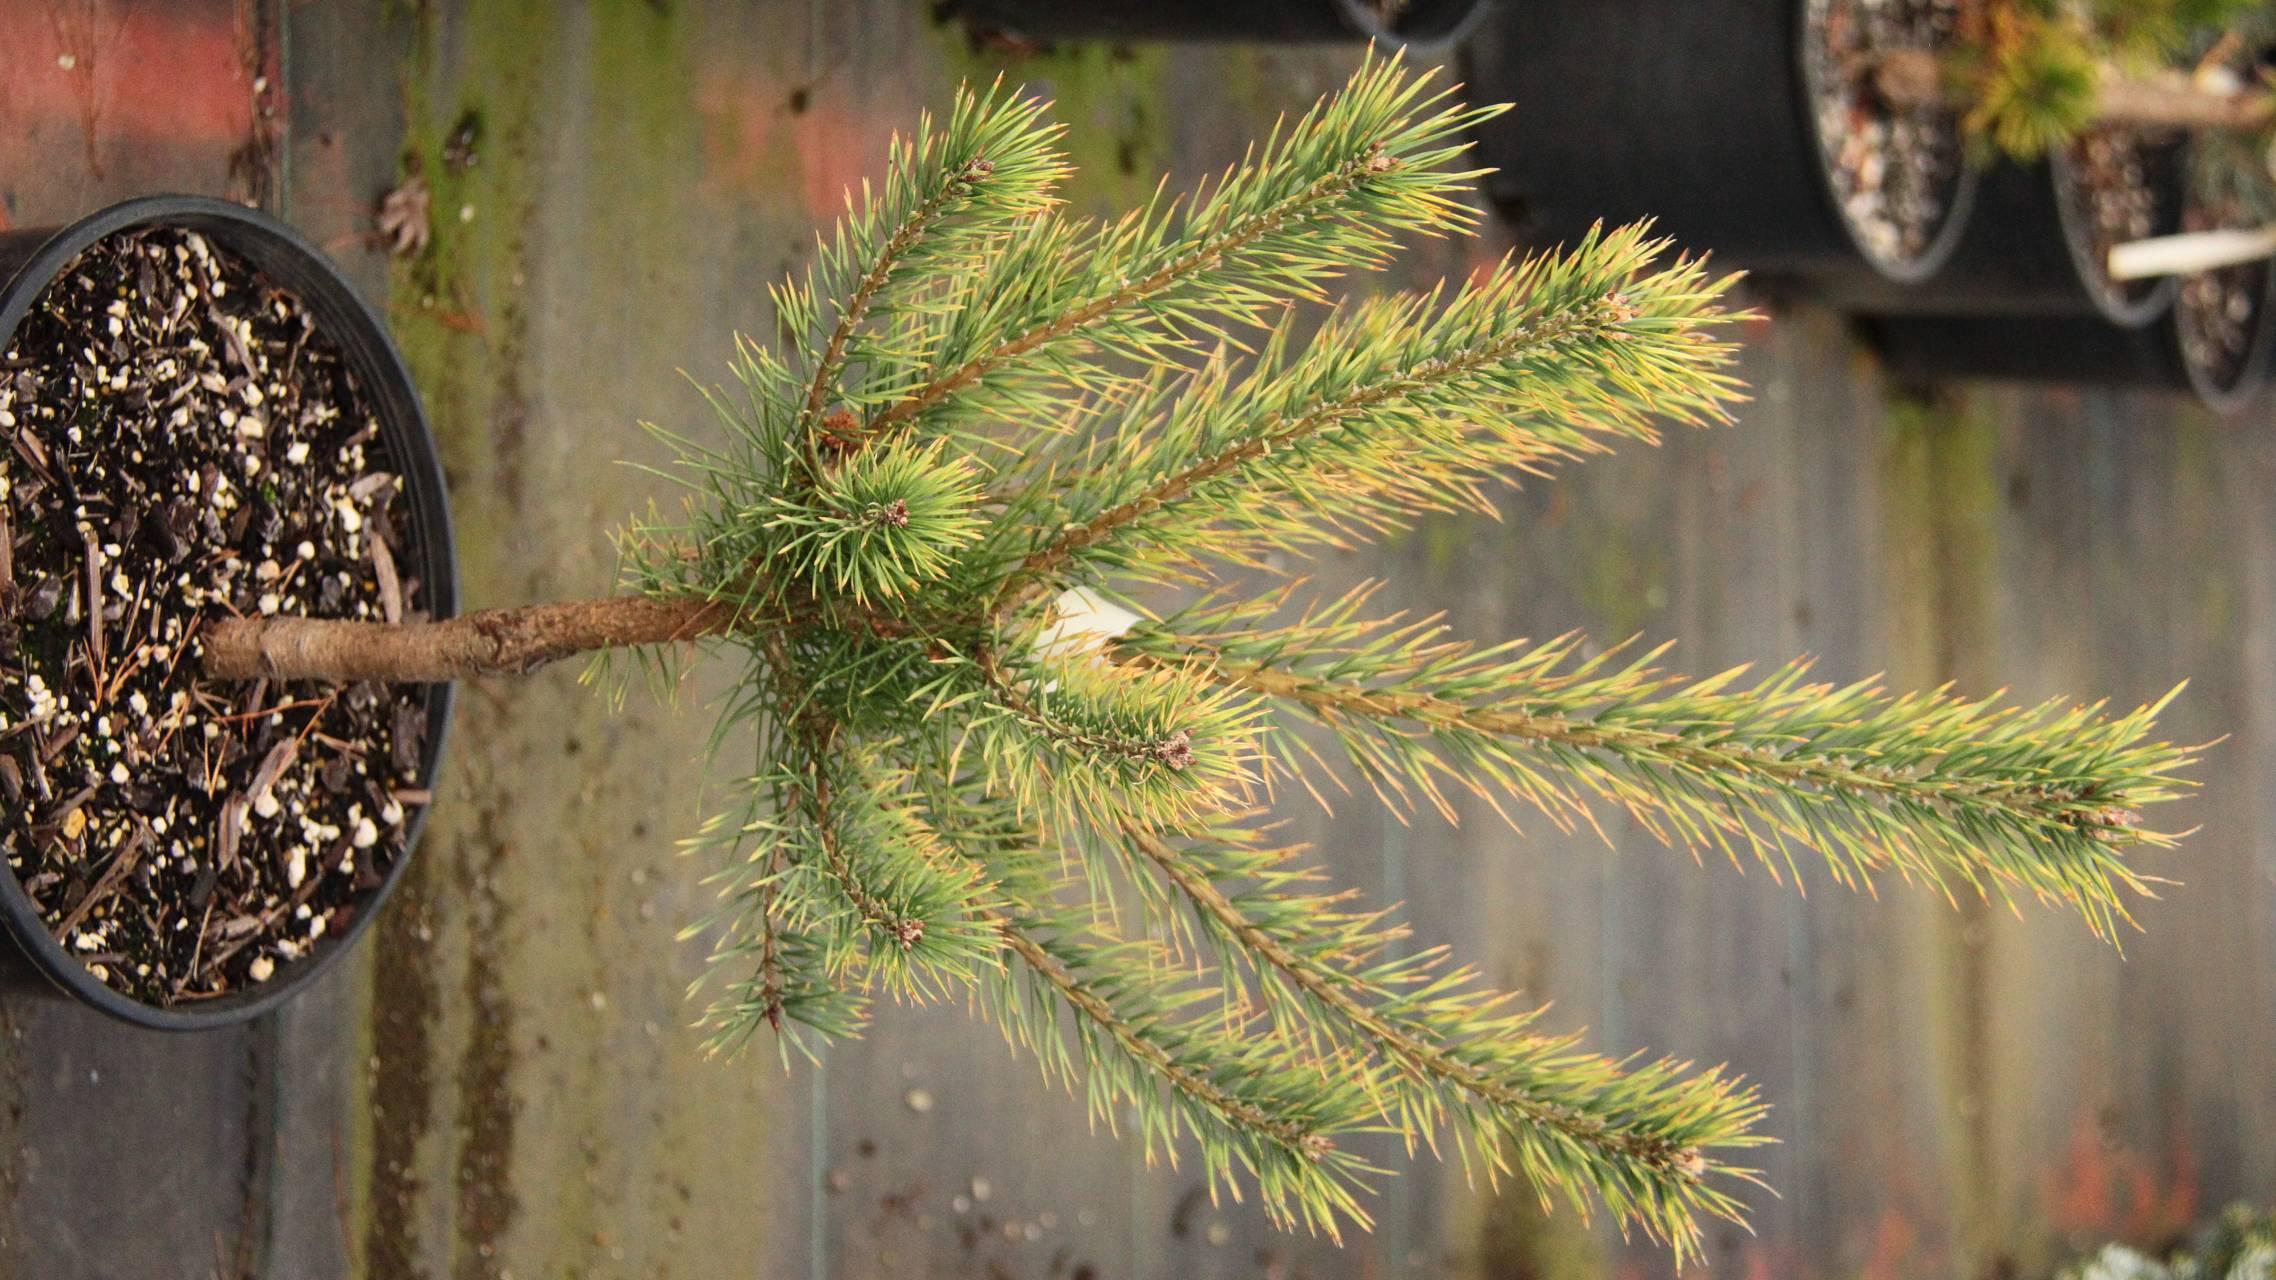 Pinus sylvestris Brentmoor Blonde conifer evergreen yellow